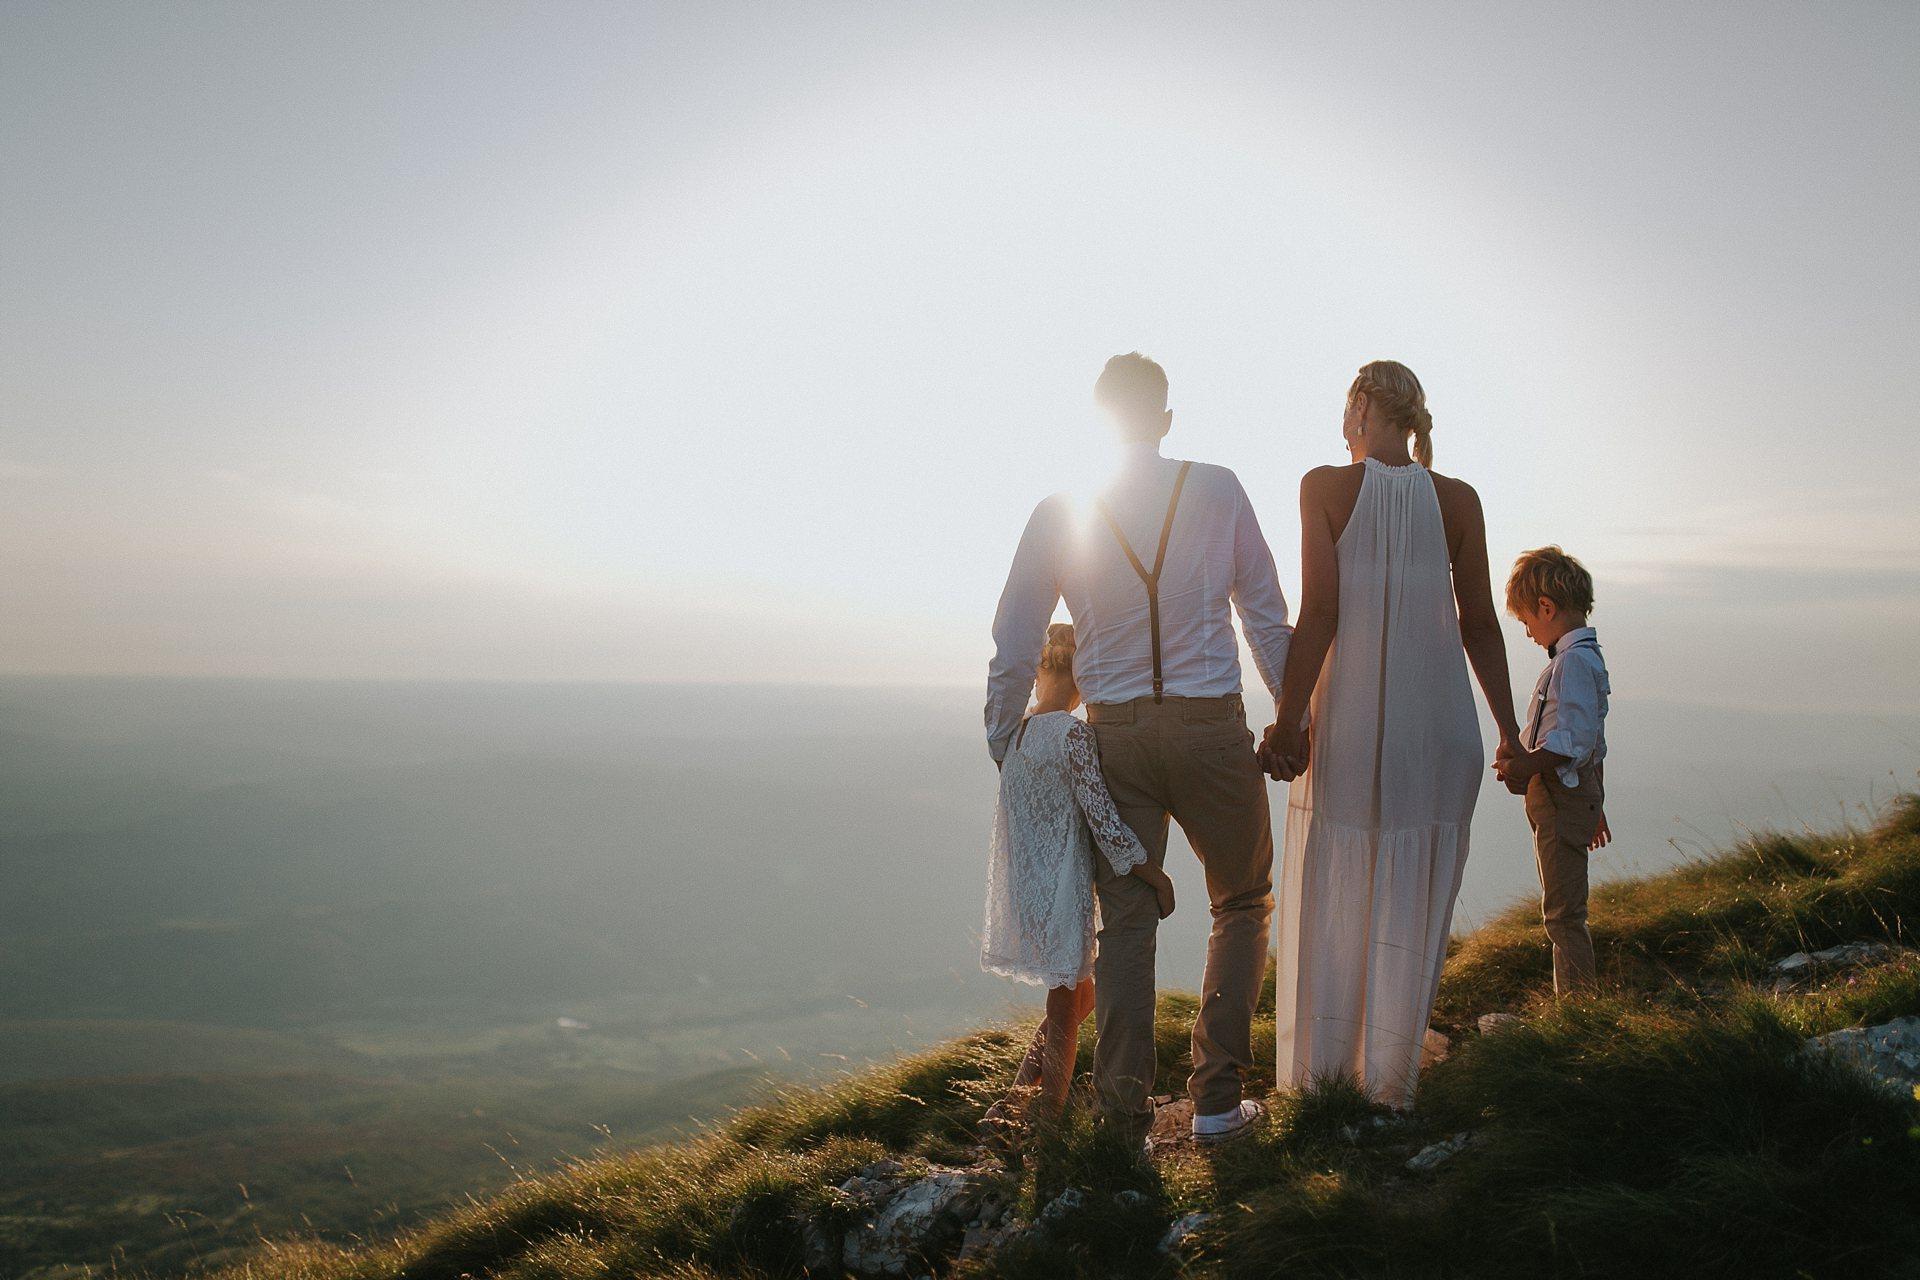 Dalibora_Bijelic_Croatia_family_vacation_photographer_0010.jpg